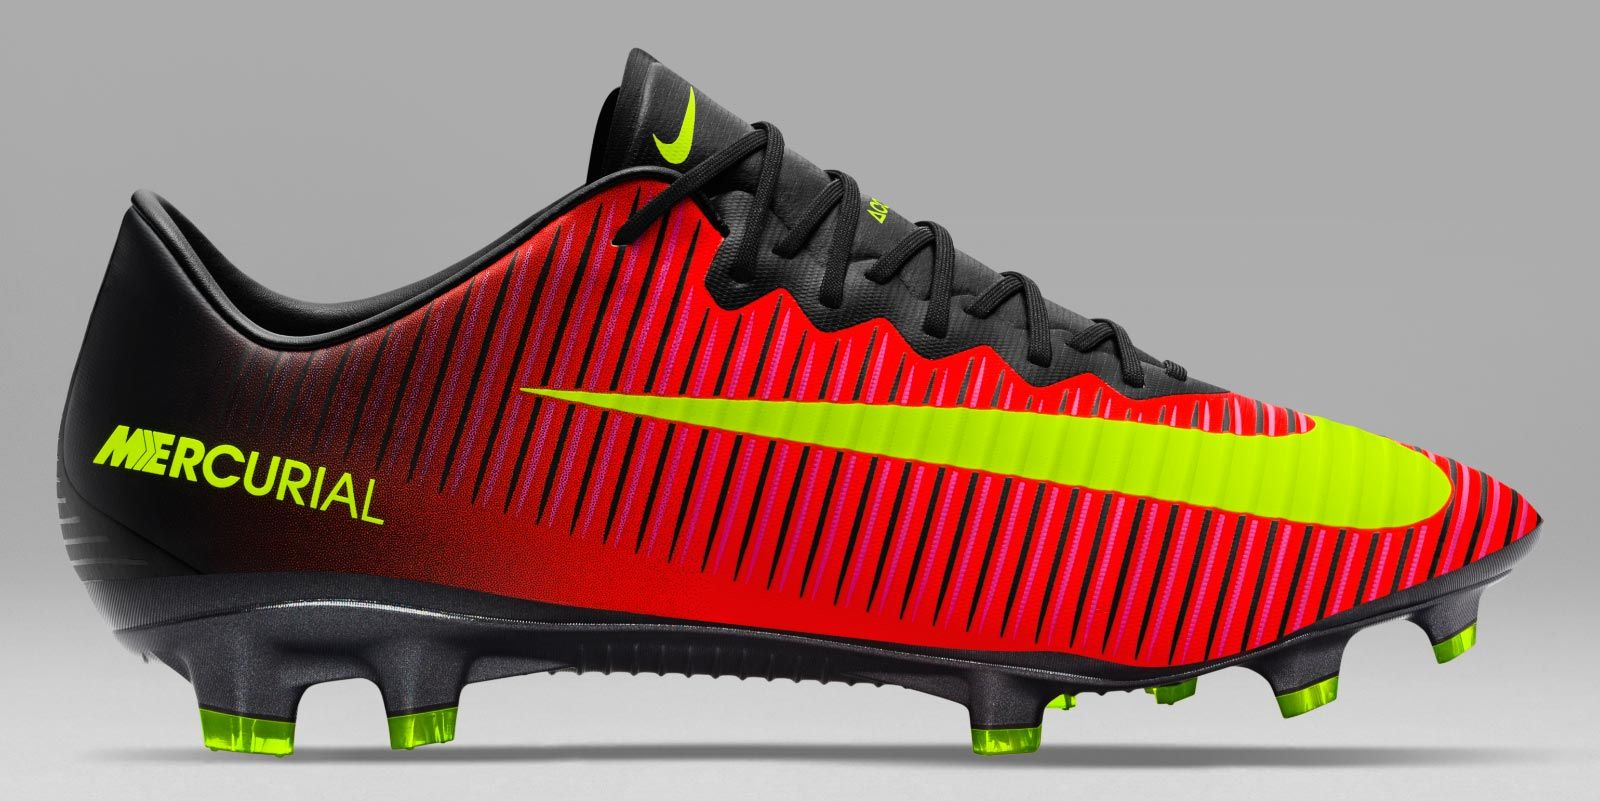 Next Gen Nike Mercurial Vapor 11 Euro 2016 Boots Released Futebol